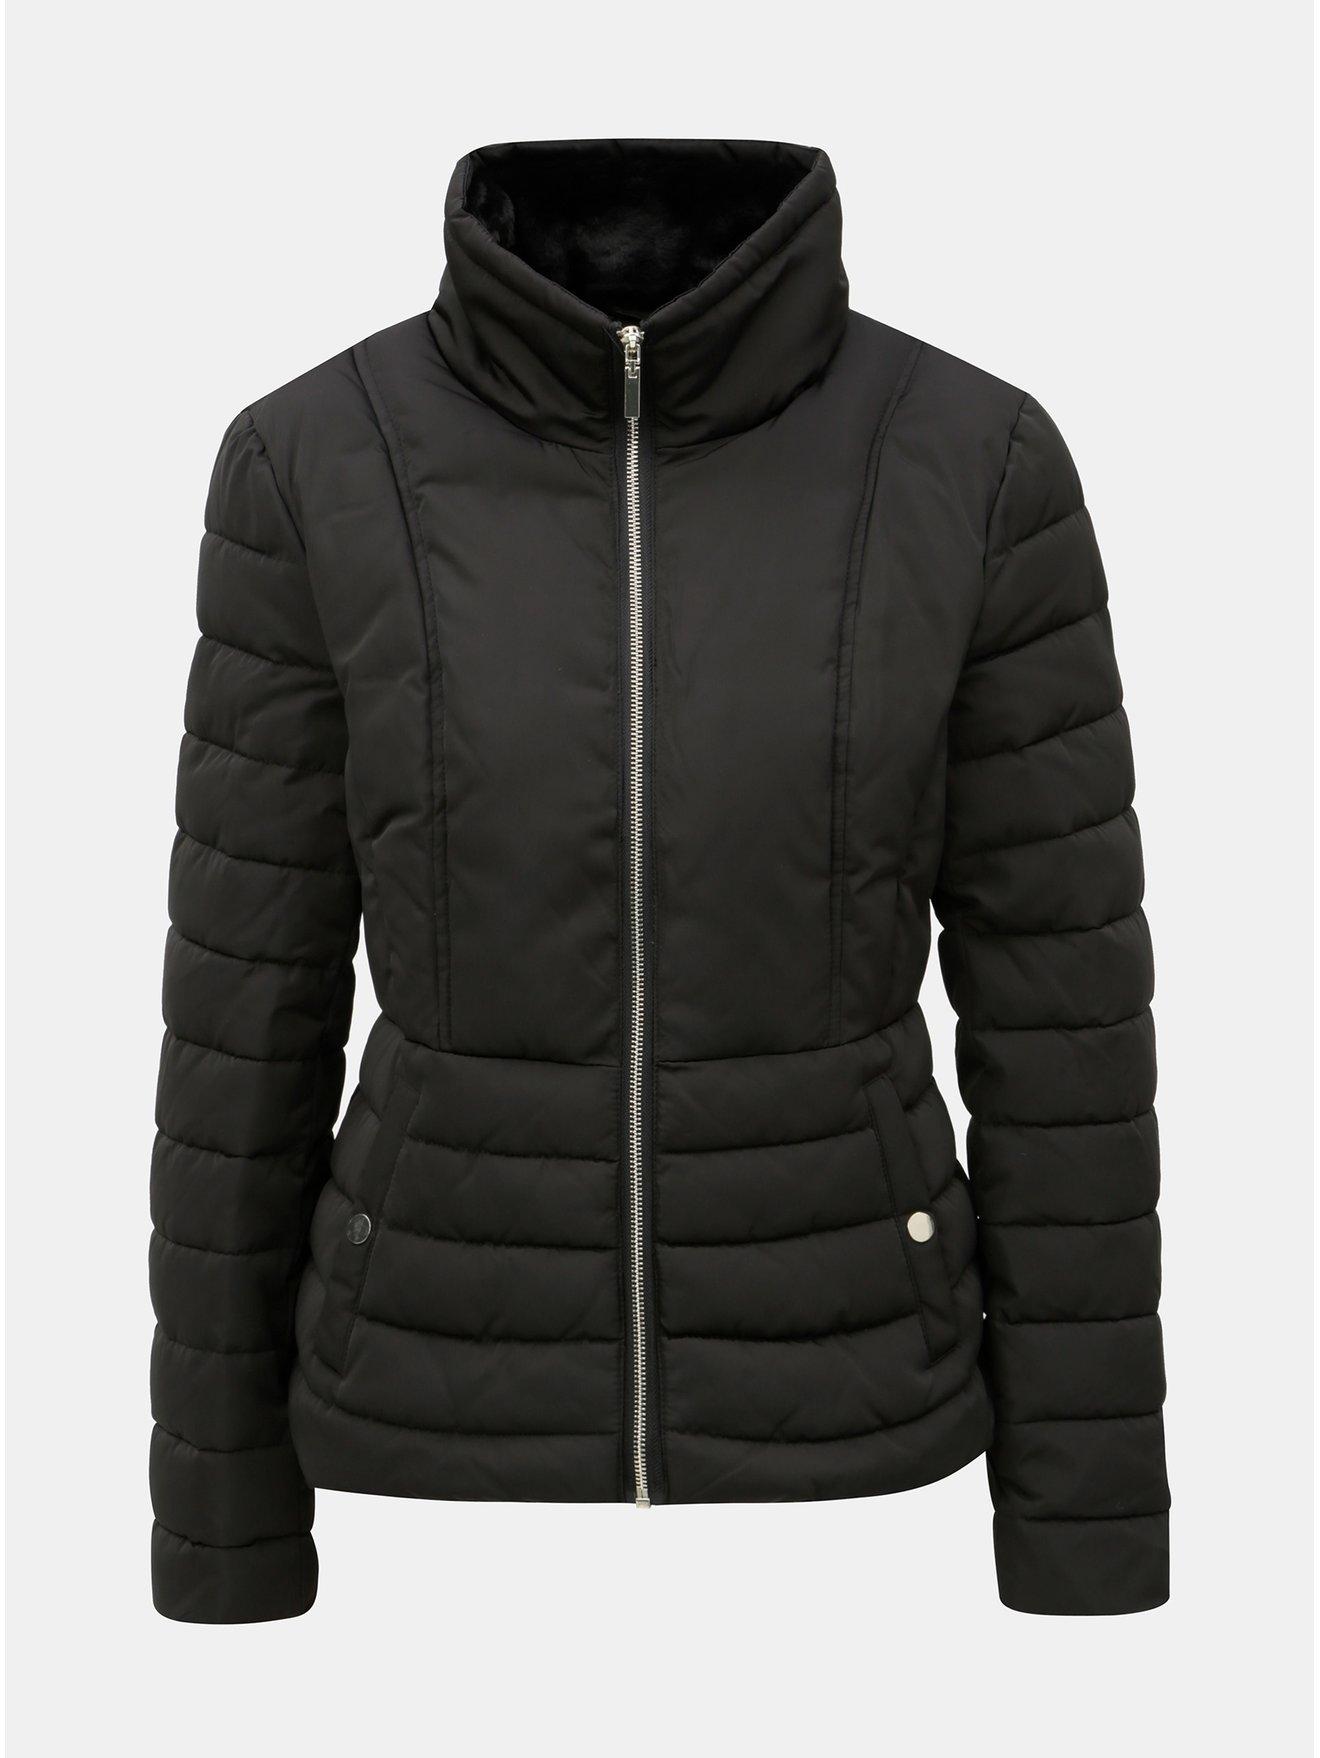 Čierna prešívaná zimná bunda s vysokým golierom Miss Selfridge b88a408749a